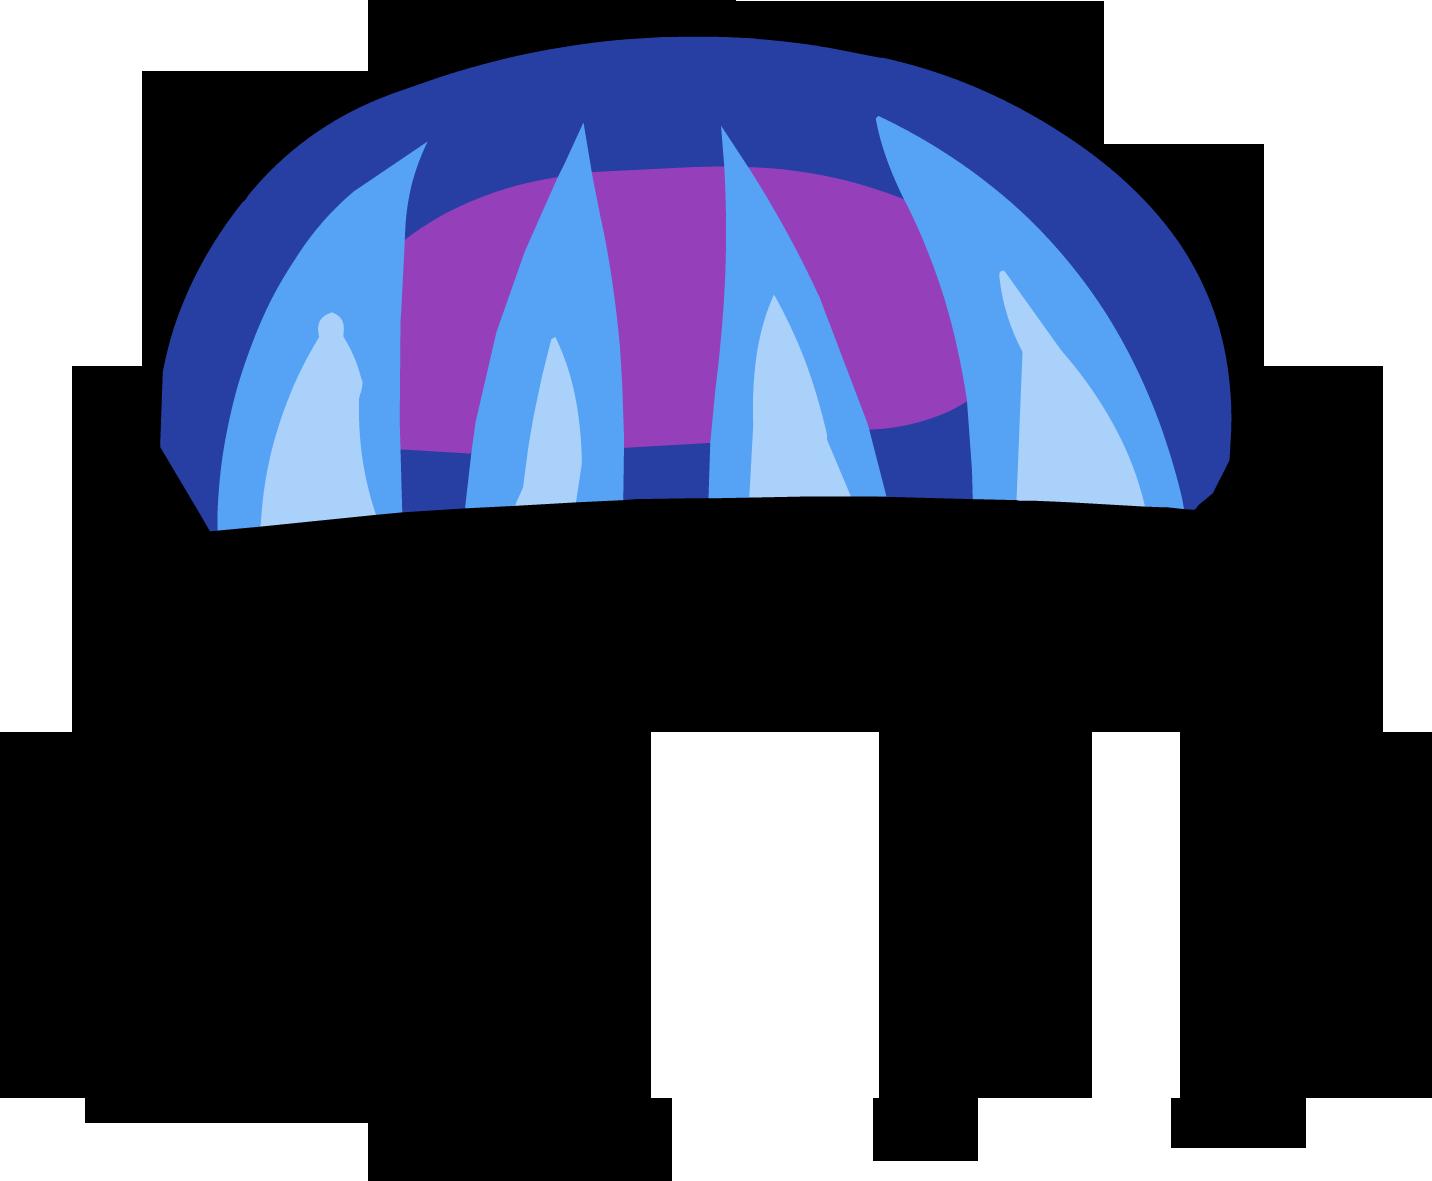 Clipart rainbow jellyfish. Club penguin wiki fandom